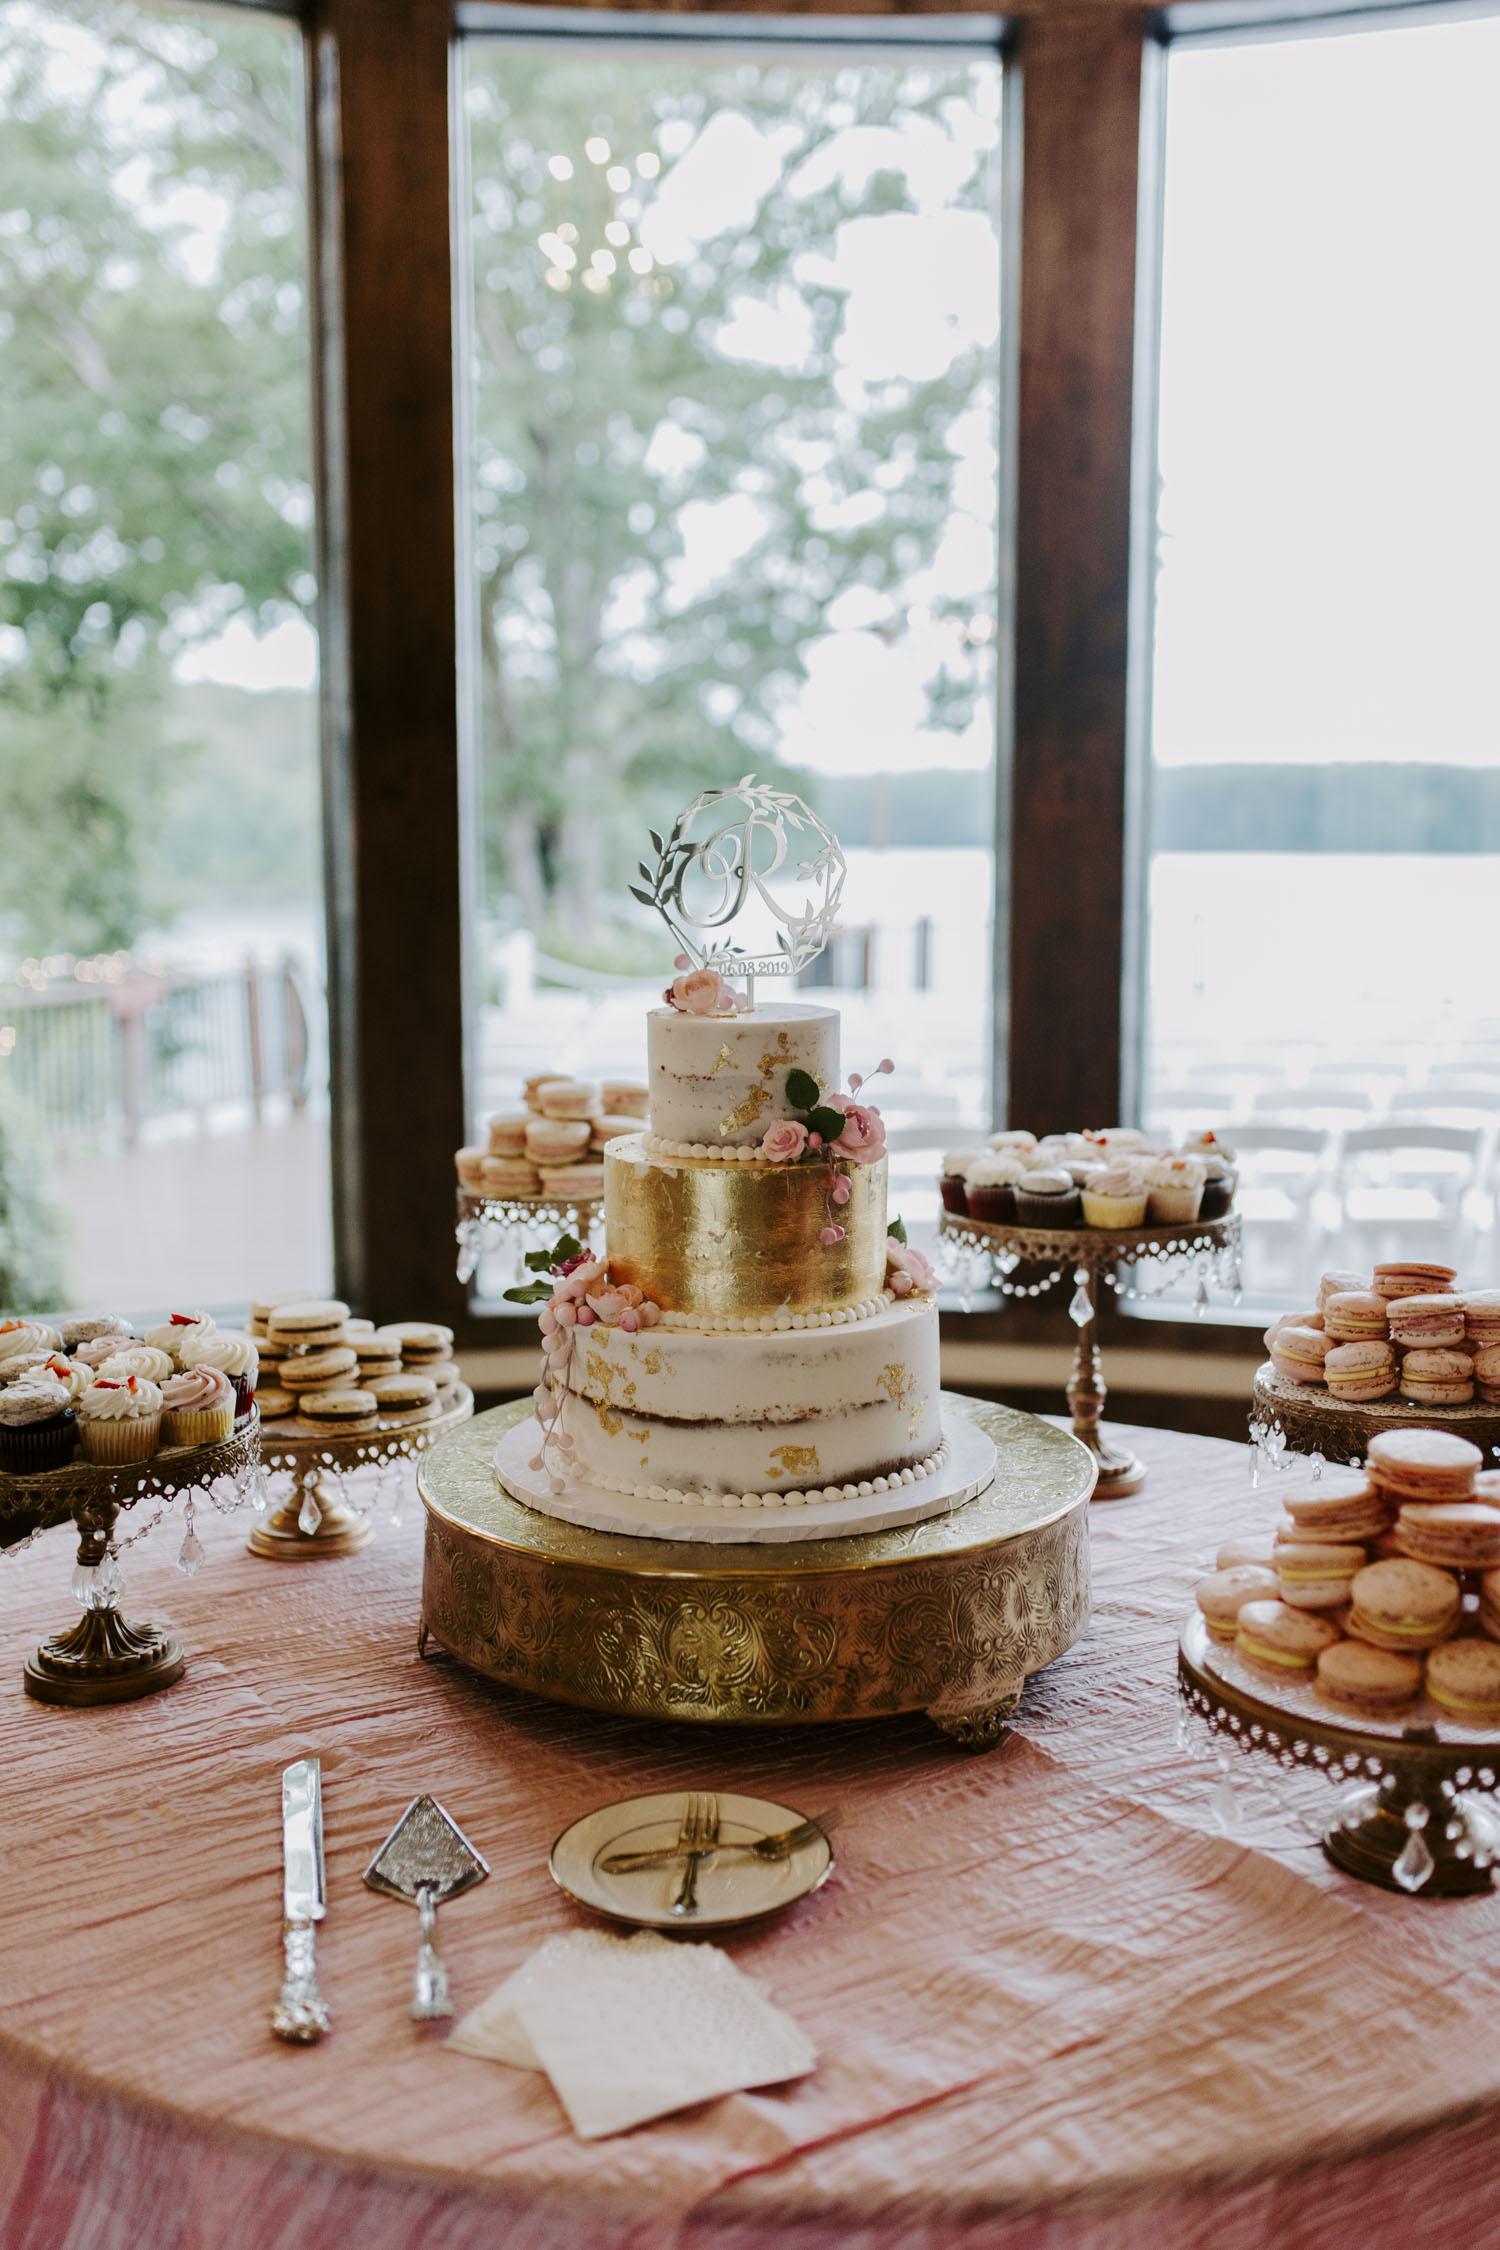 Rainy Bella Collina Wedding Cake, Macarons, and Cupcakes | Kayli LaFon Photography, Greensboro Winston-Salem NC Wedding Photographer